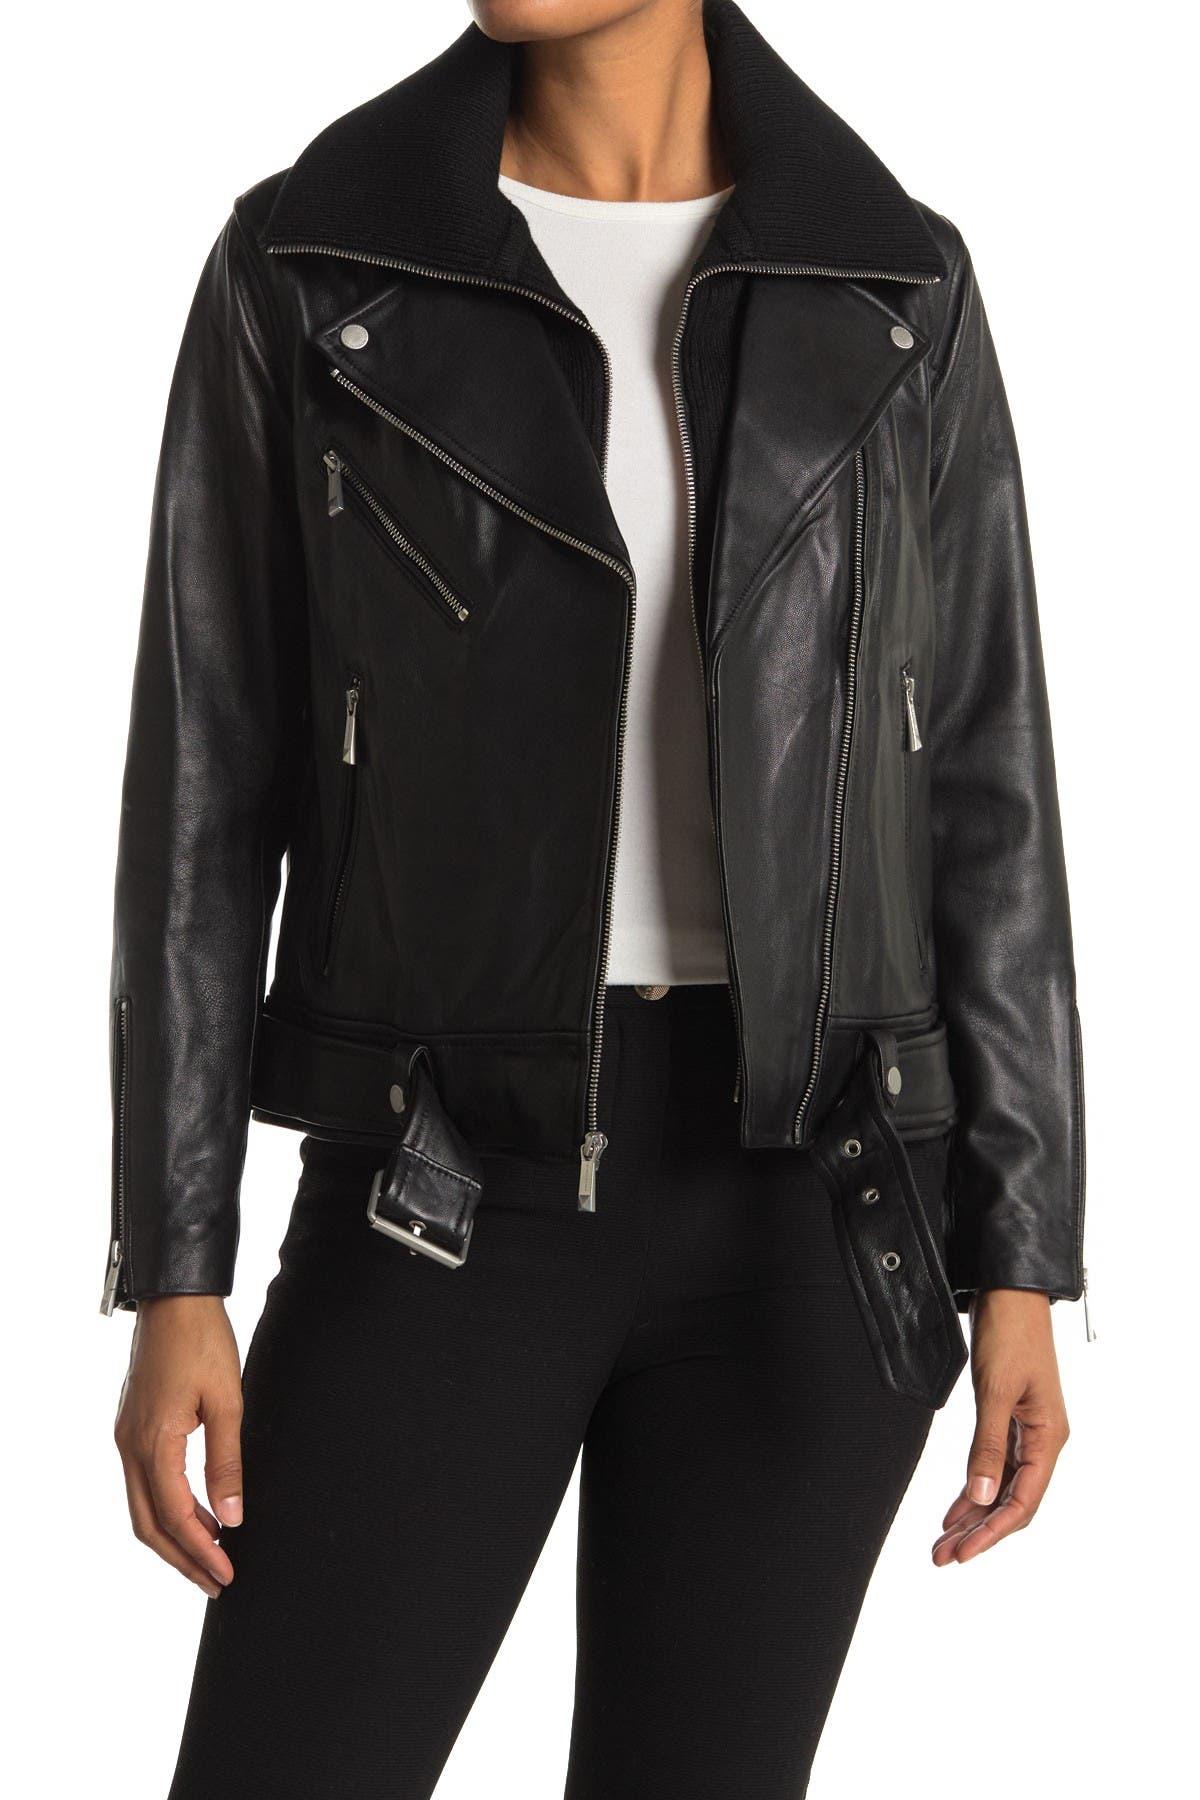 Image of BCBGMAXAZRIA Knit Trim Lamb Leather Jacket